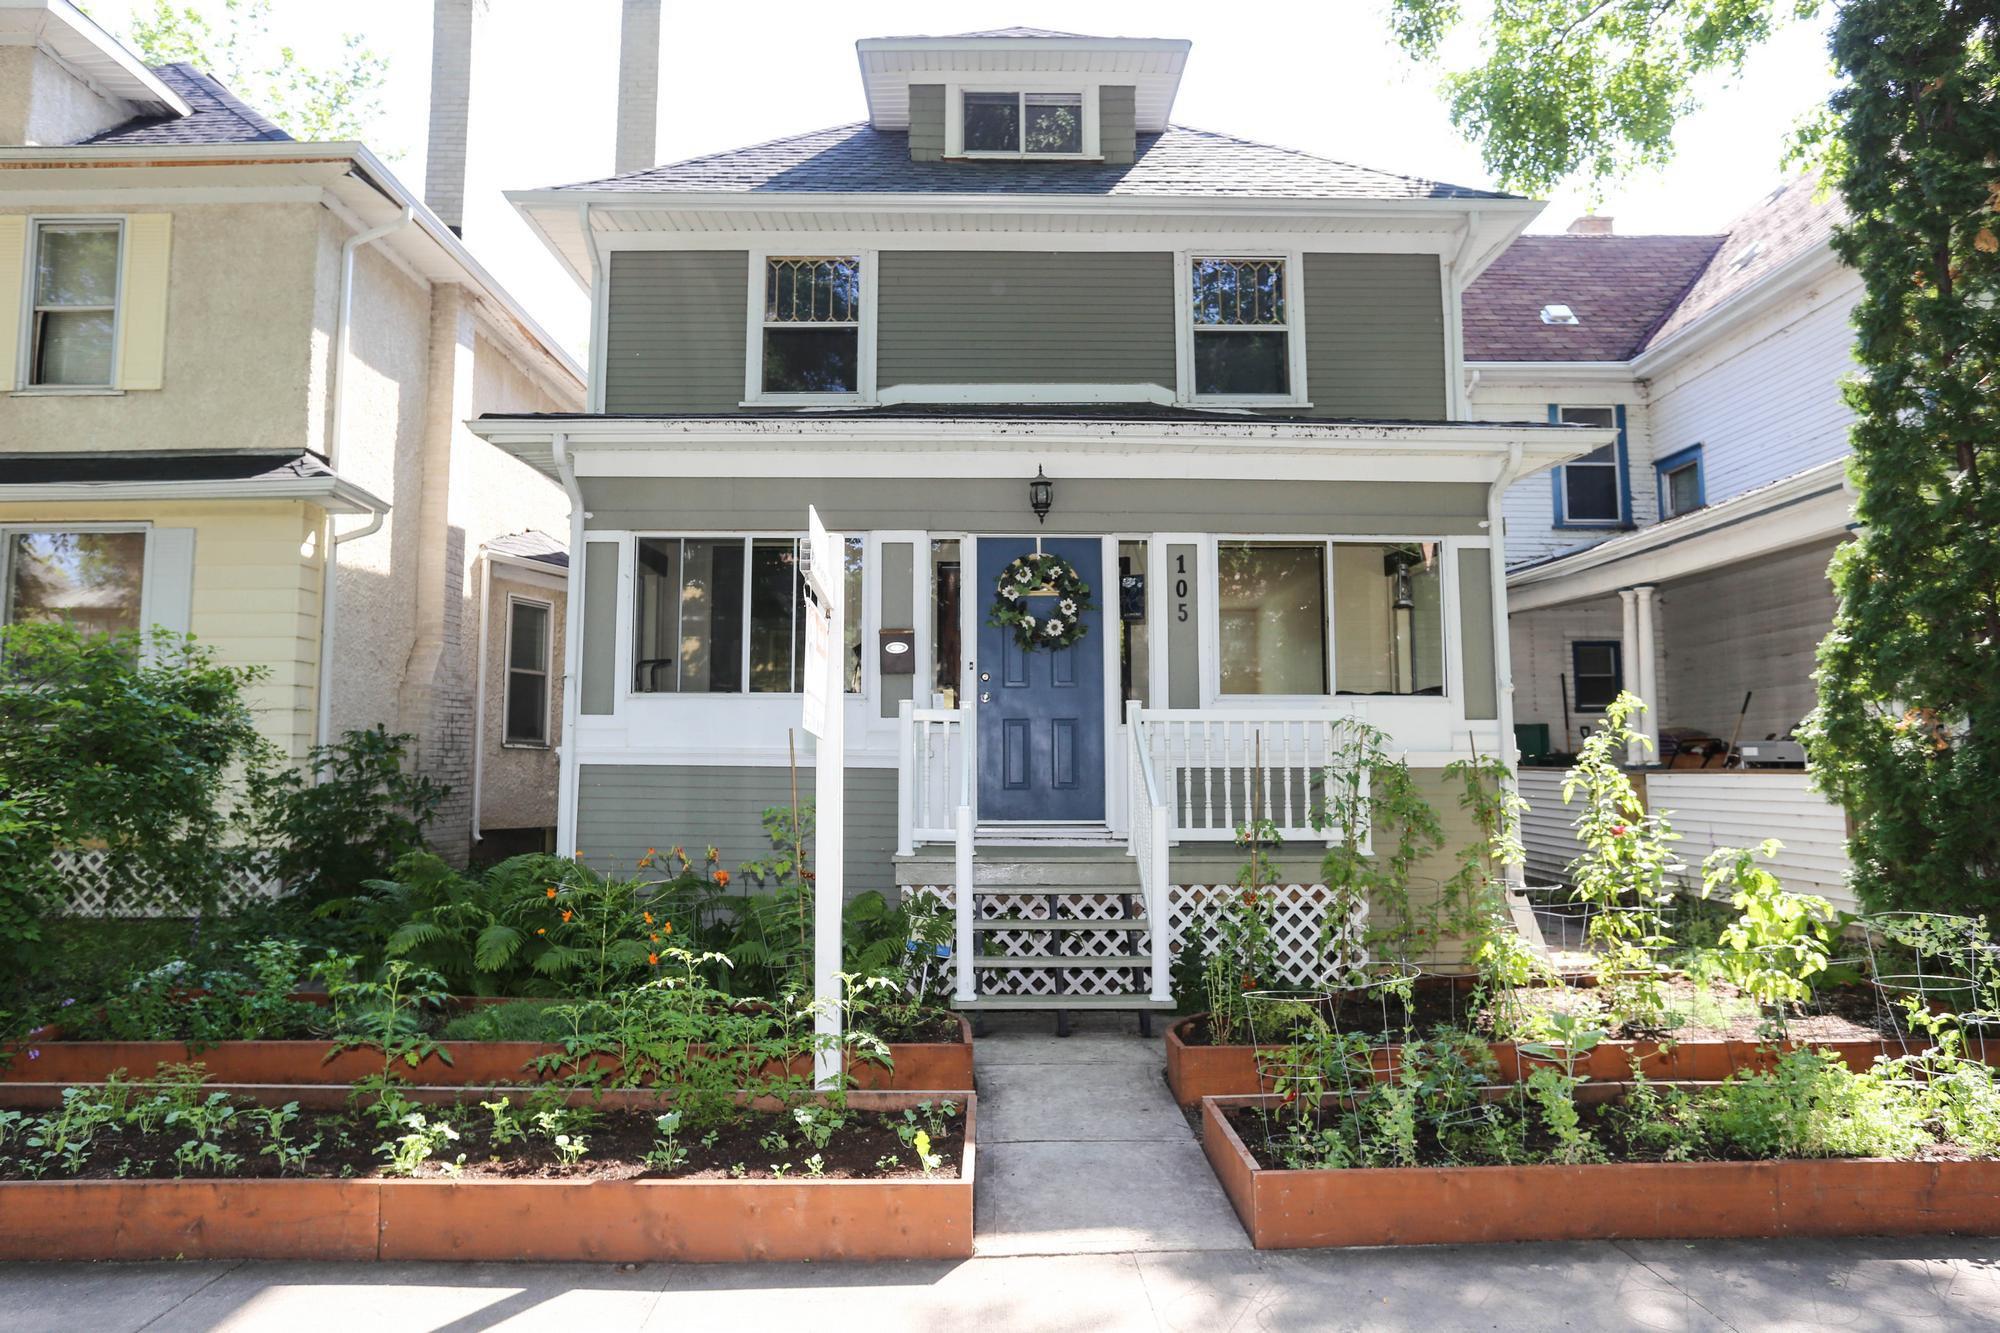 Photo 2: Photos: 105 Evanson Street in Winnipeg: Wolseley Single Family Detached for sale (5B)  : MLS®# 1821900